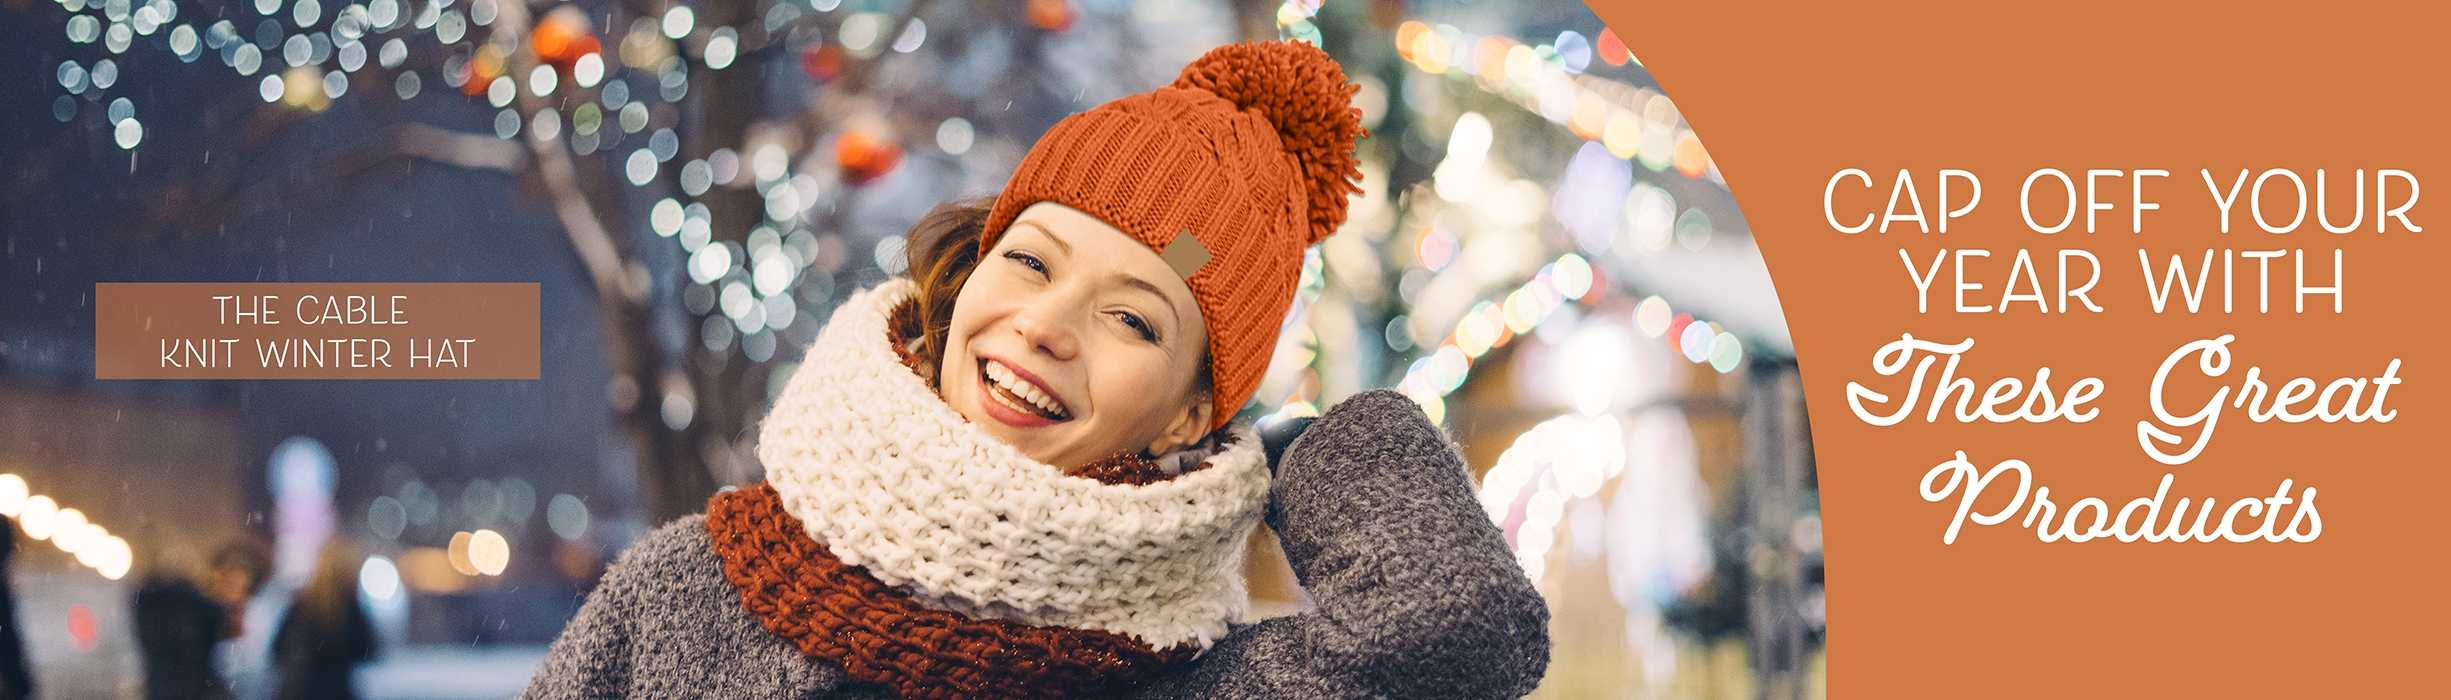 Knit Winter Hat AIM